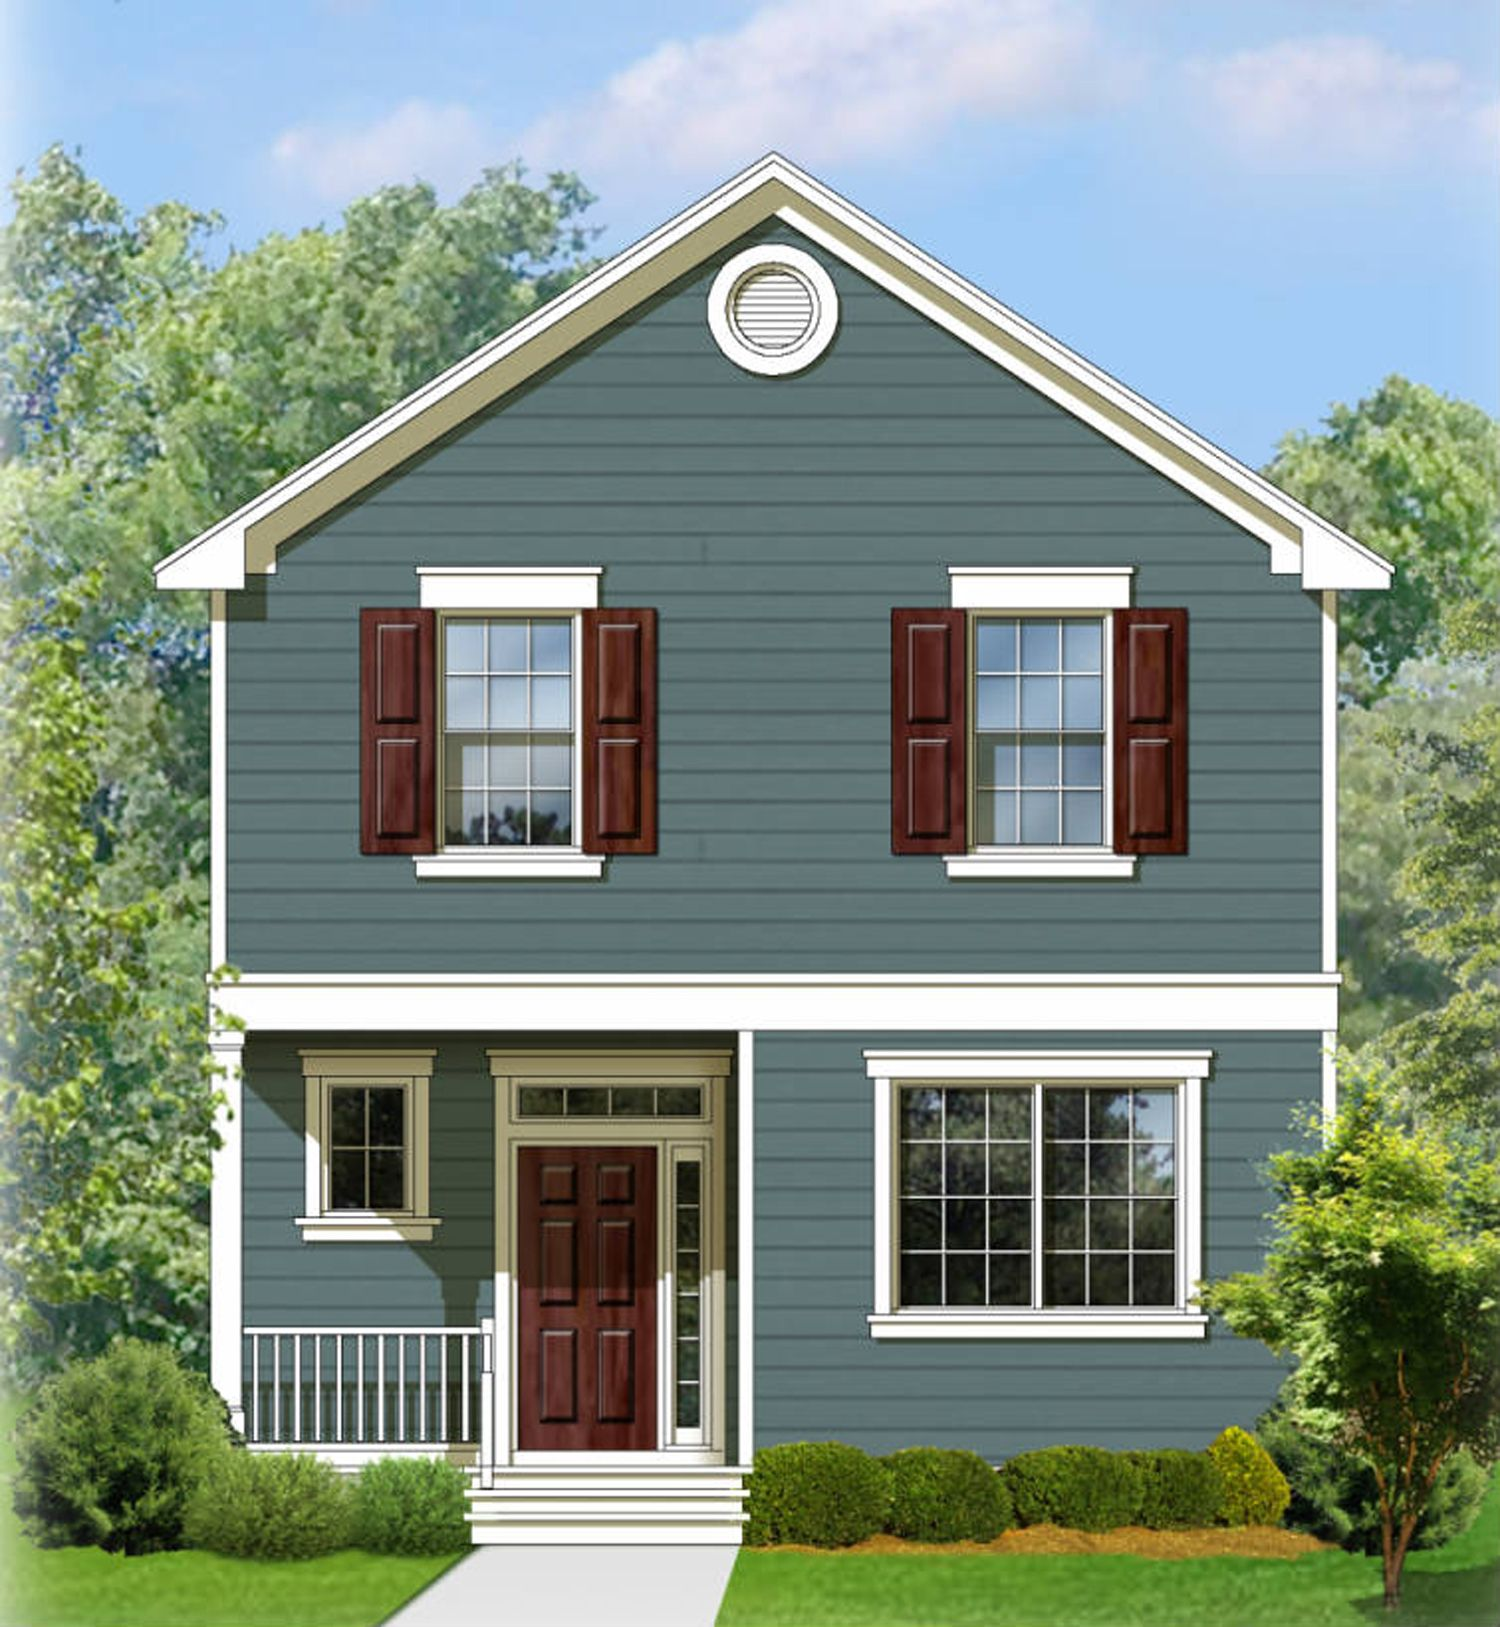 Plan 82083KA: Two Story Traditional House Plan | Colonial ...